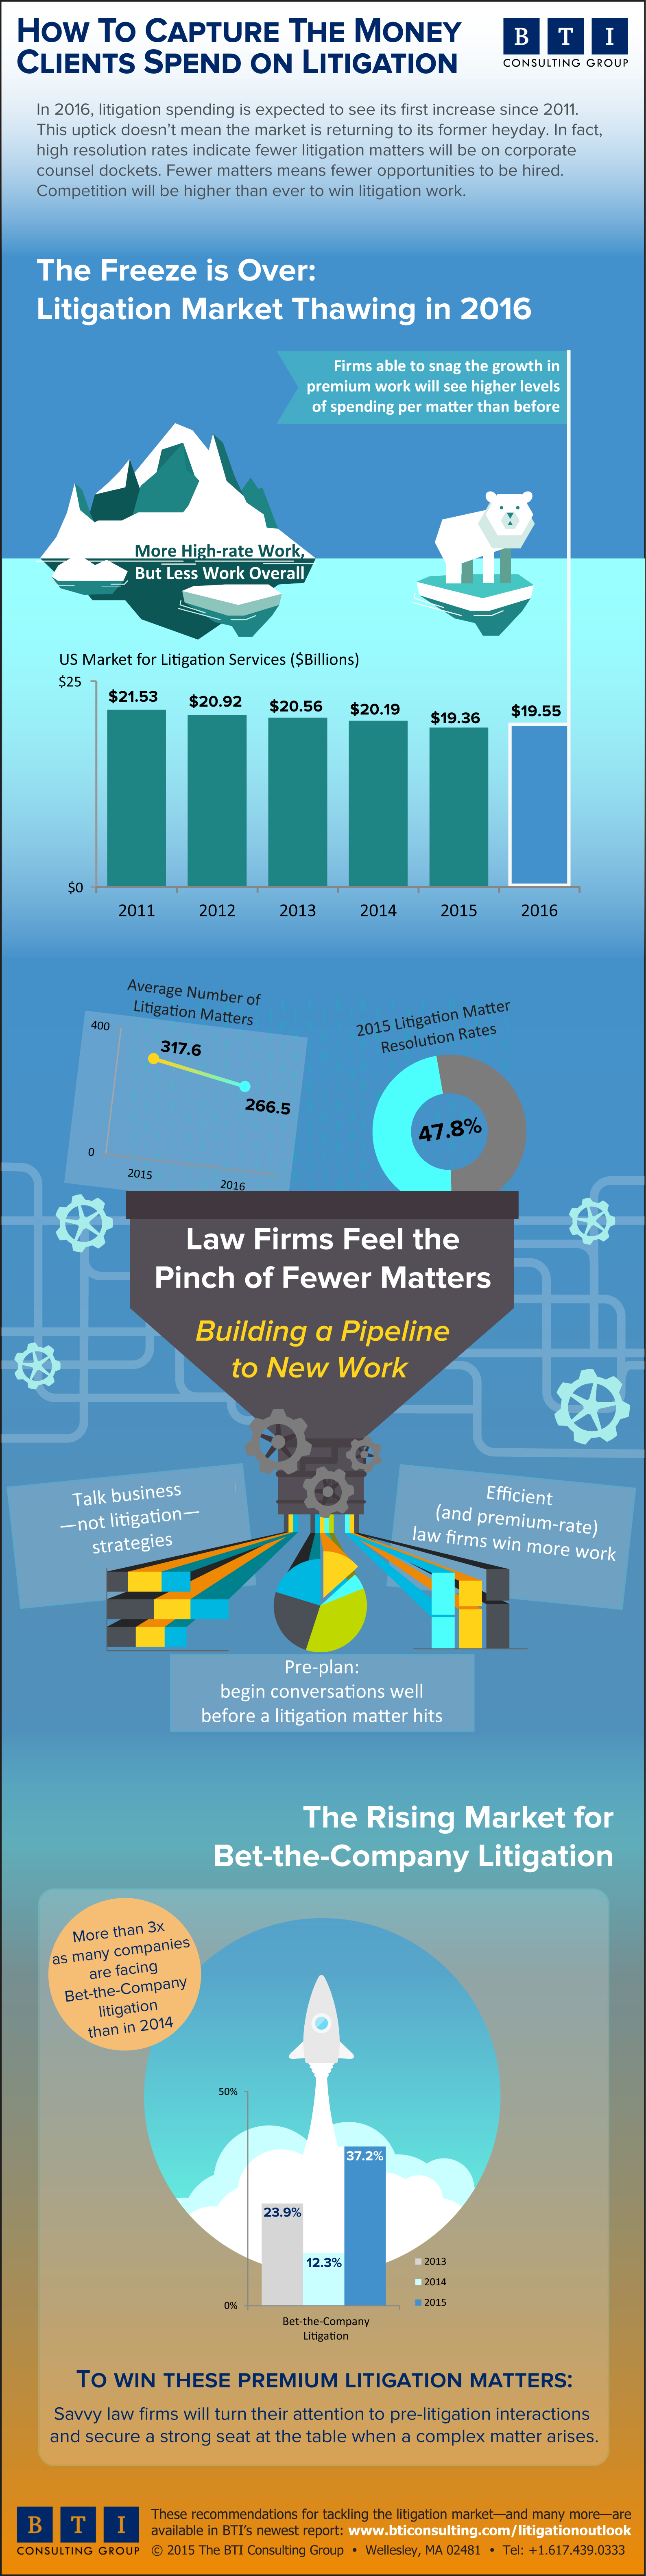 BTI Litigation Trends 2016 Infographic